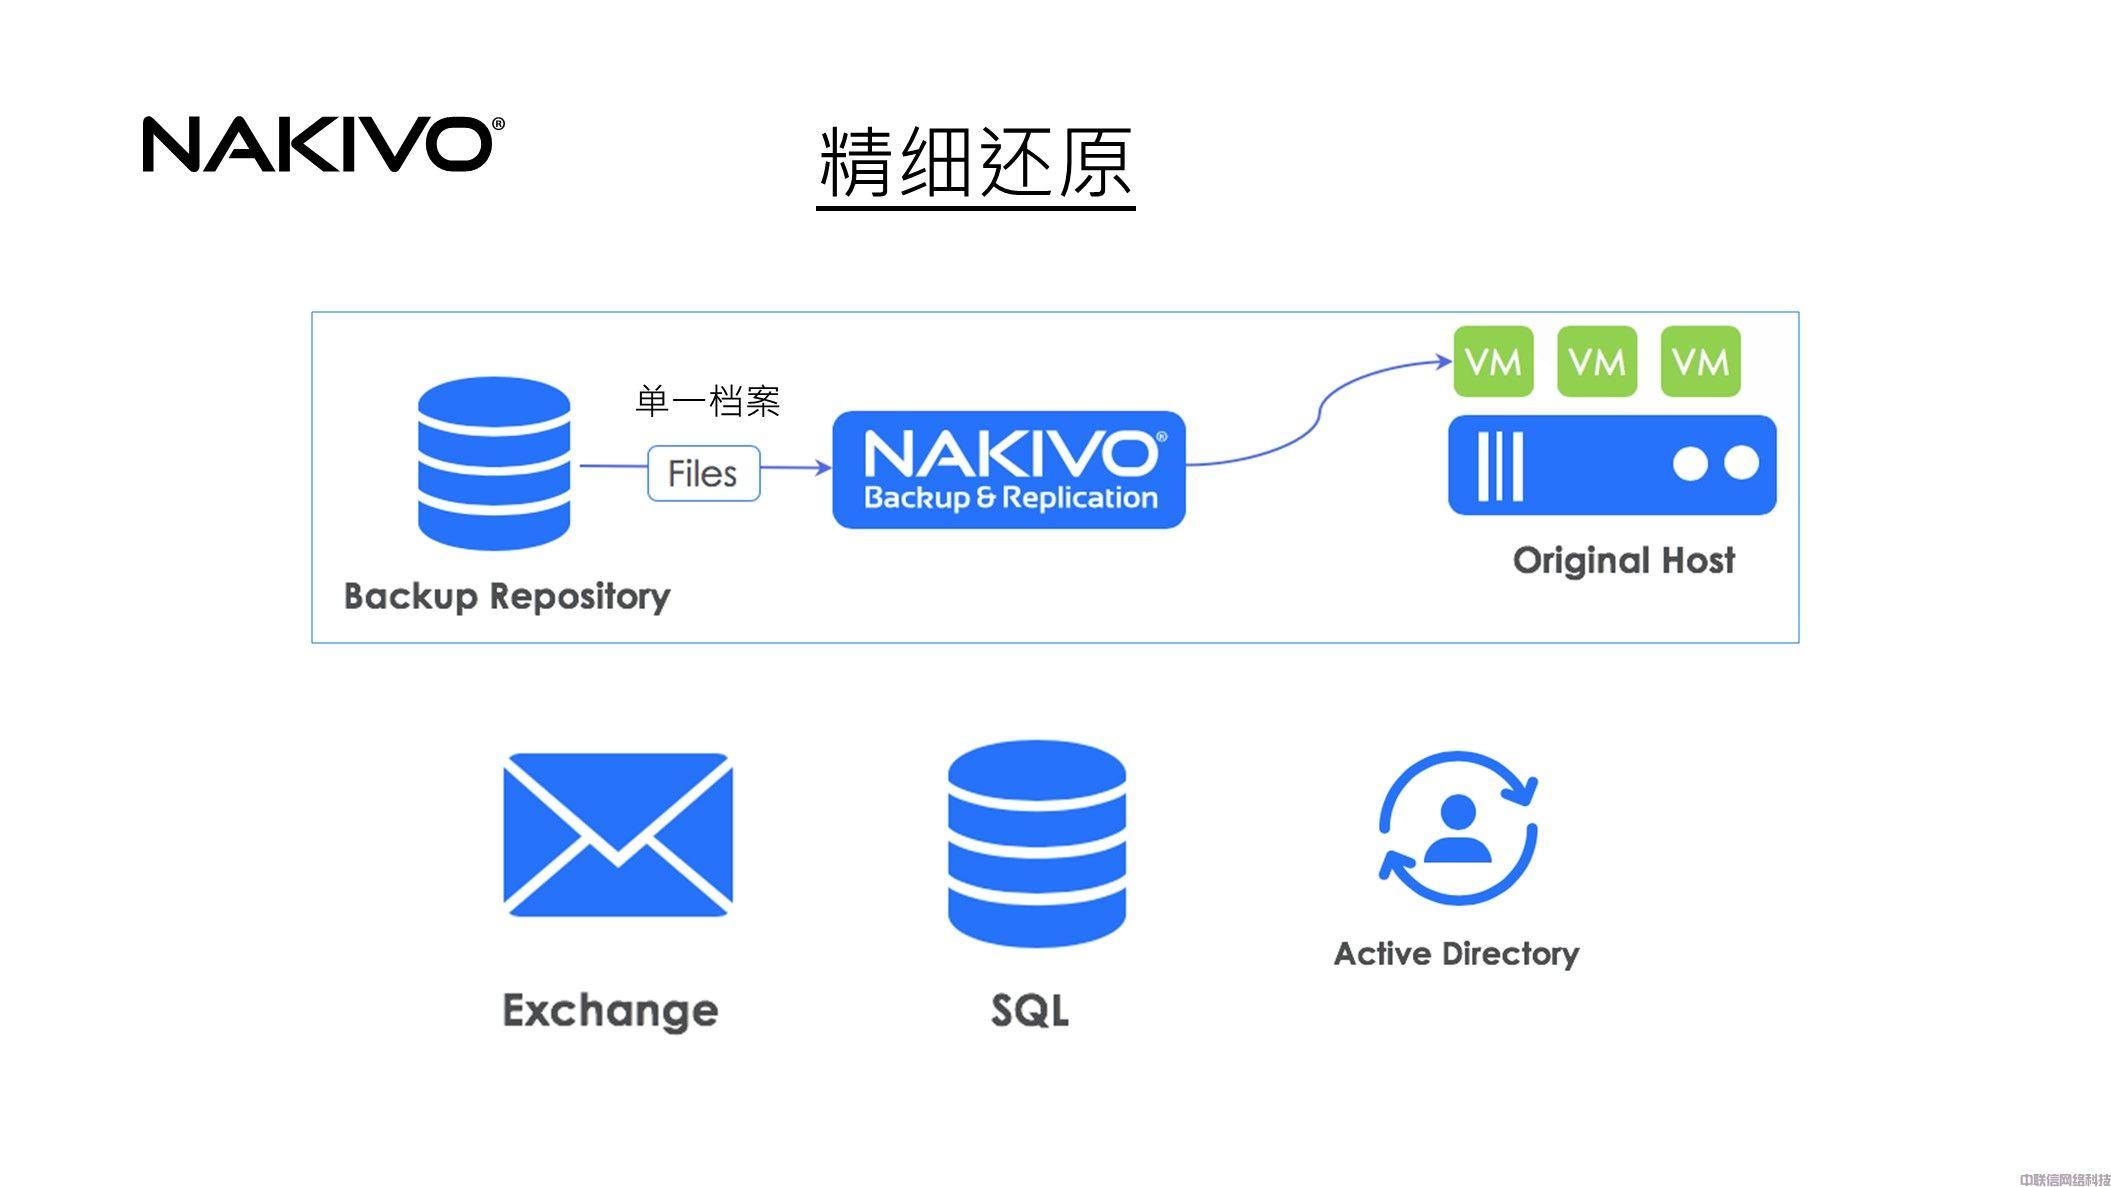 虚拟化备份方案NAKIVO Backup & Replication(图20)